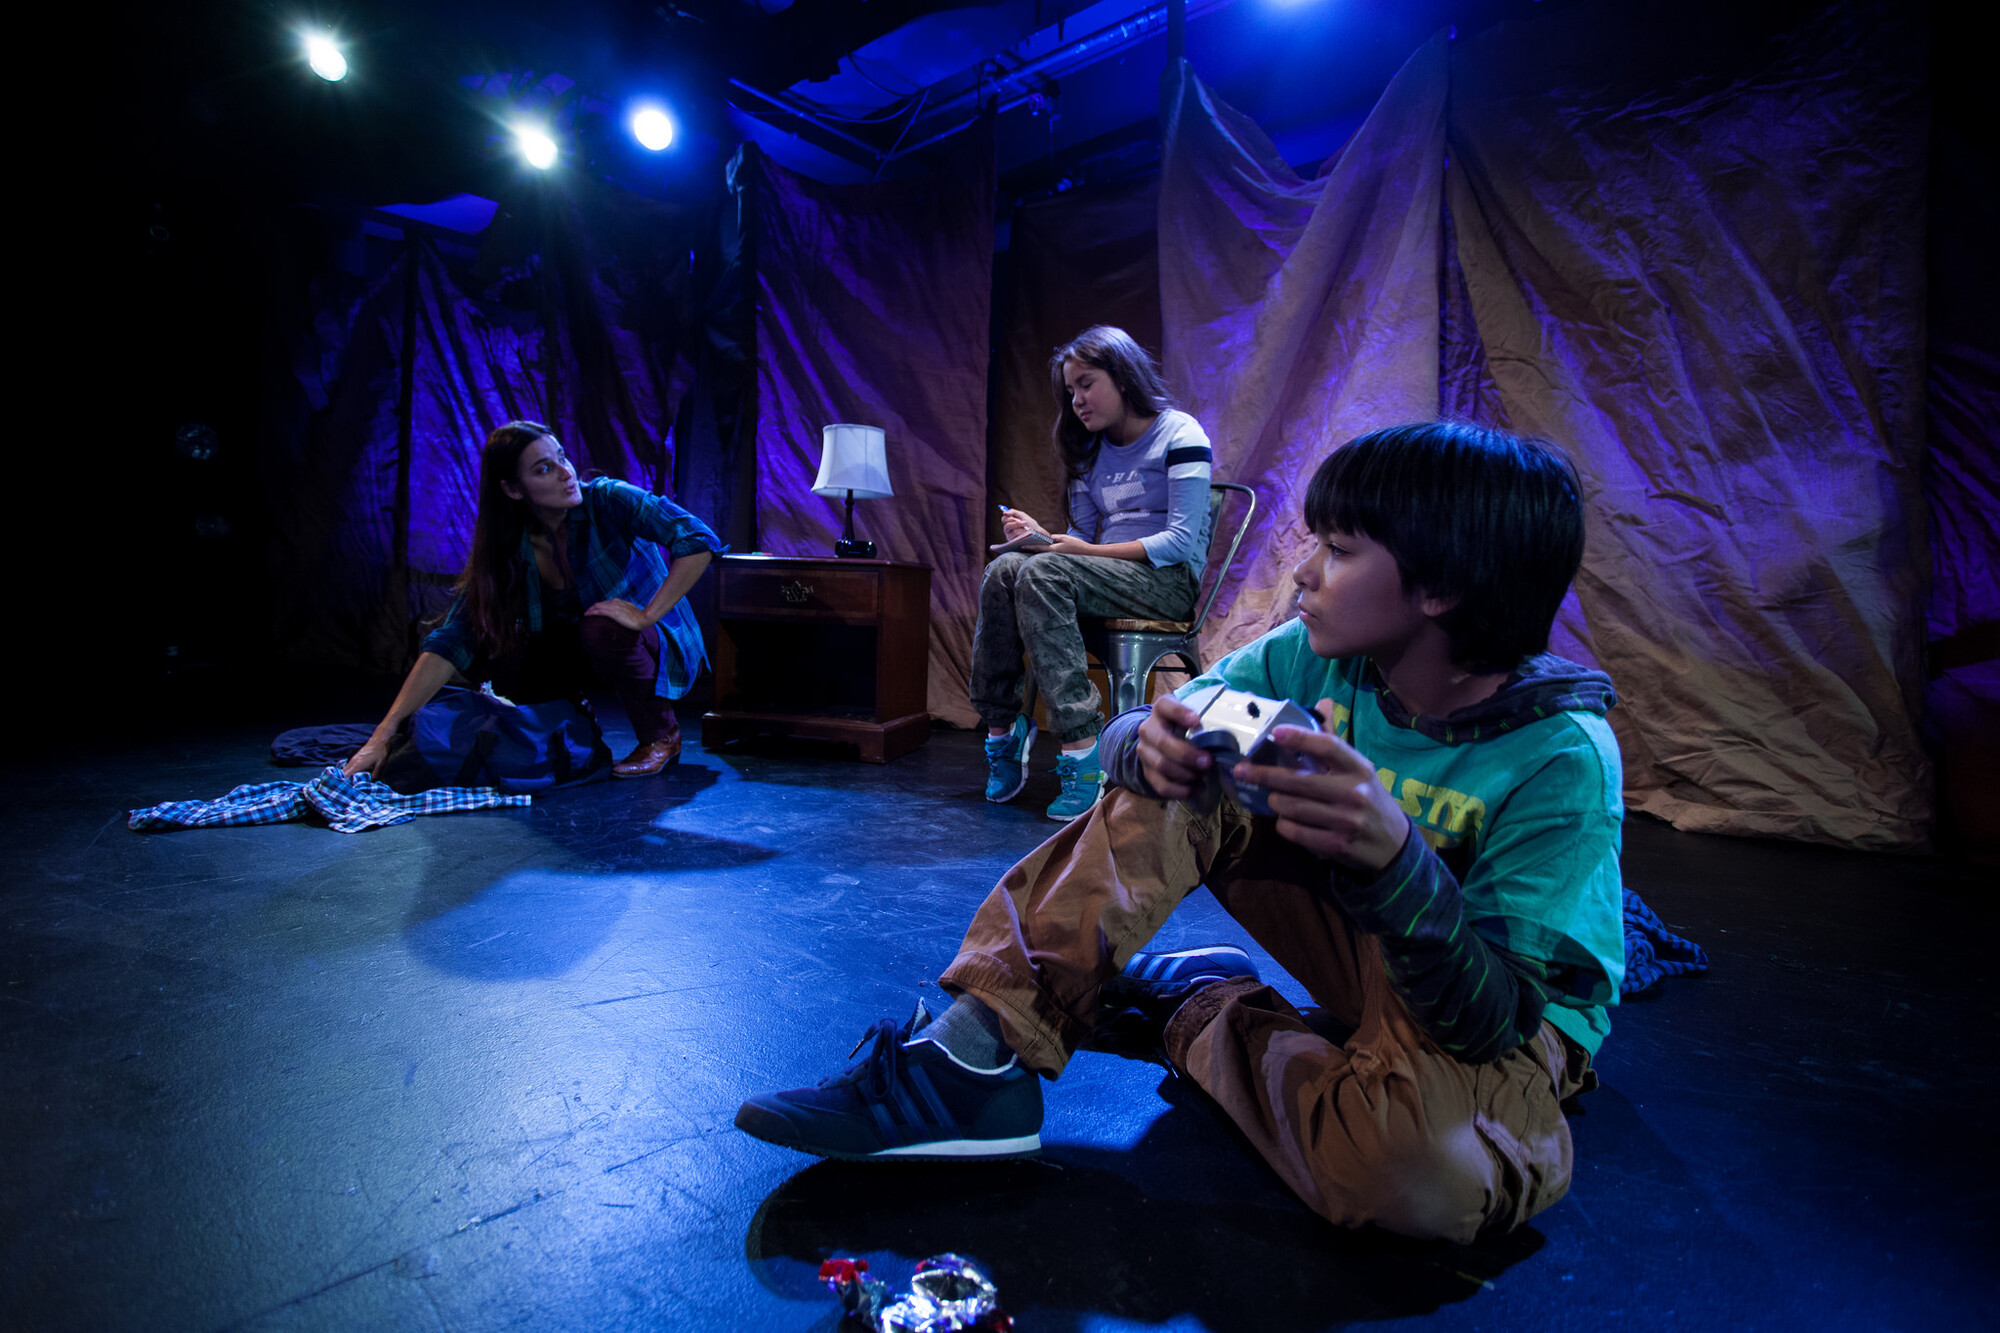 a boy sits on stage